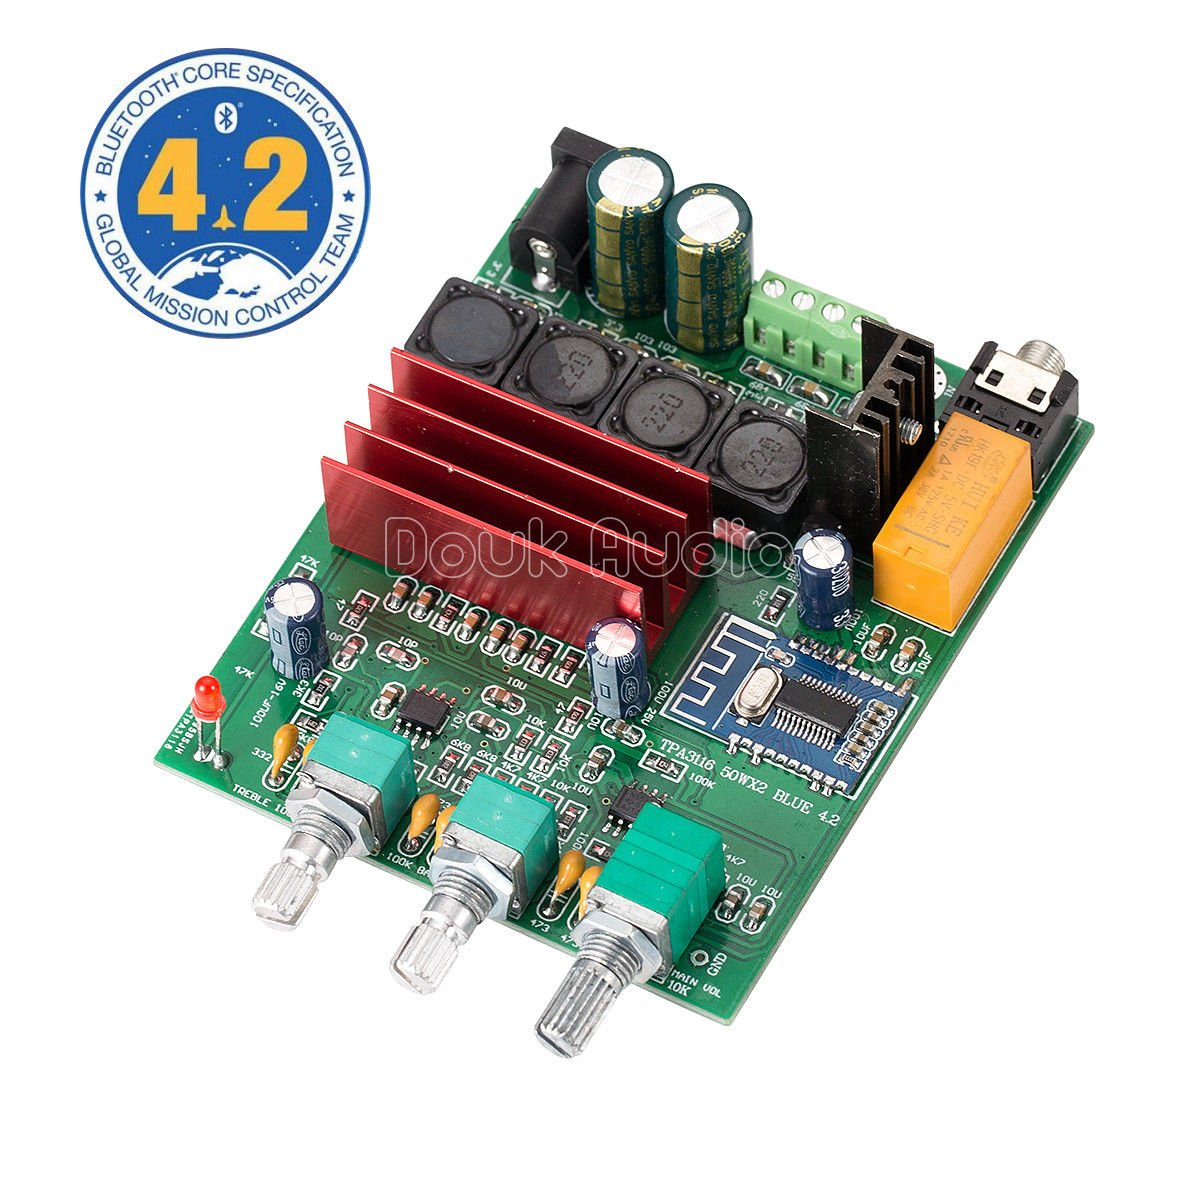 Nobsound 100W Bluetooth 4.2 TPA3116D2 2.0 Channel Digital Power Amplifier Board Stereo Amp Home Speaker Car Audio Treble Bass Tone Control (DP3)